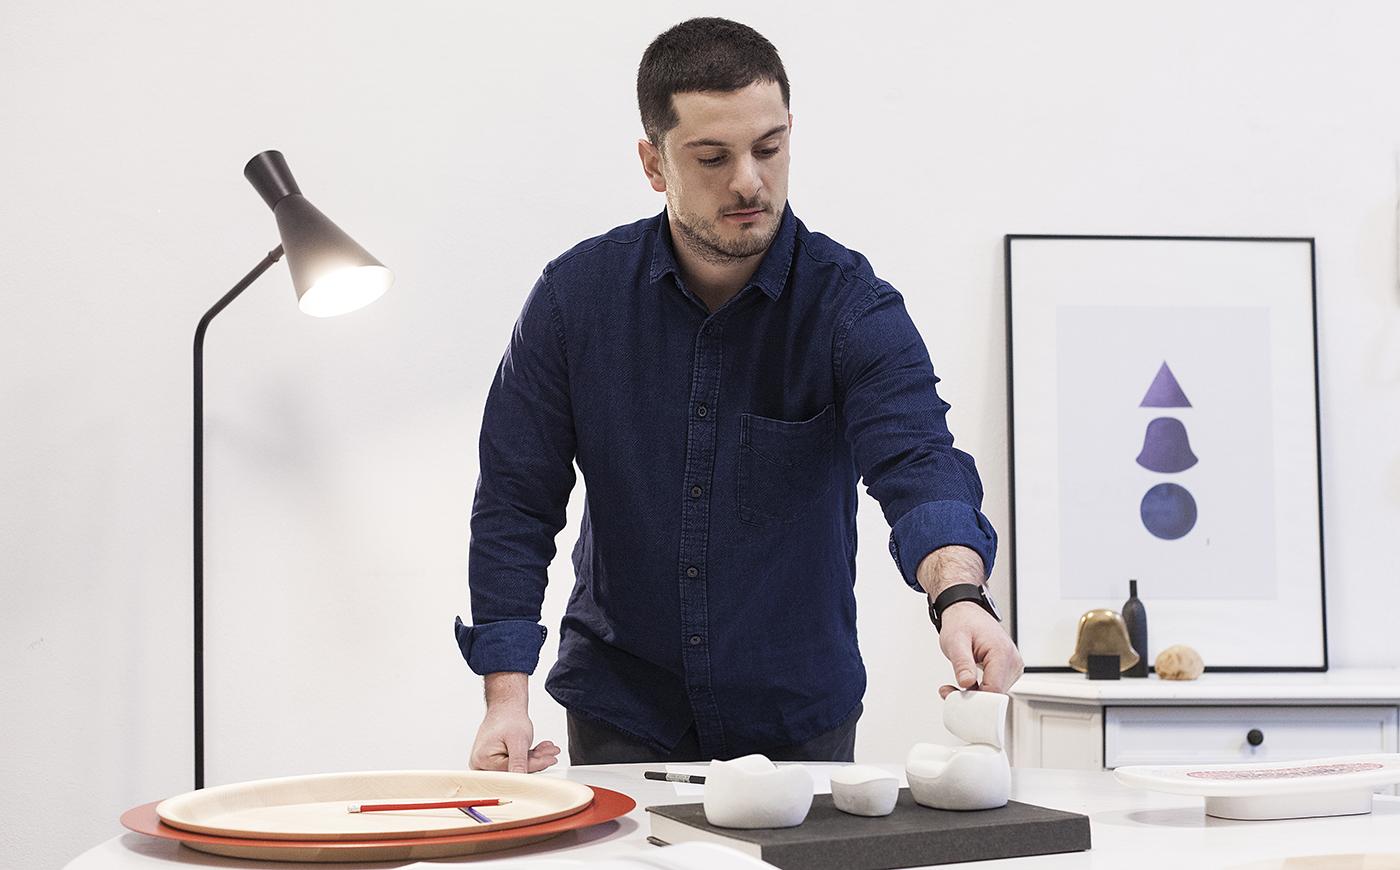 Simone Bonanni, product designer from Milan